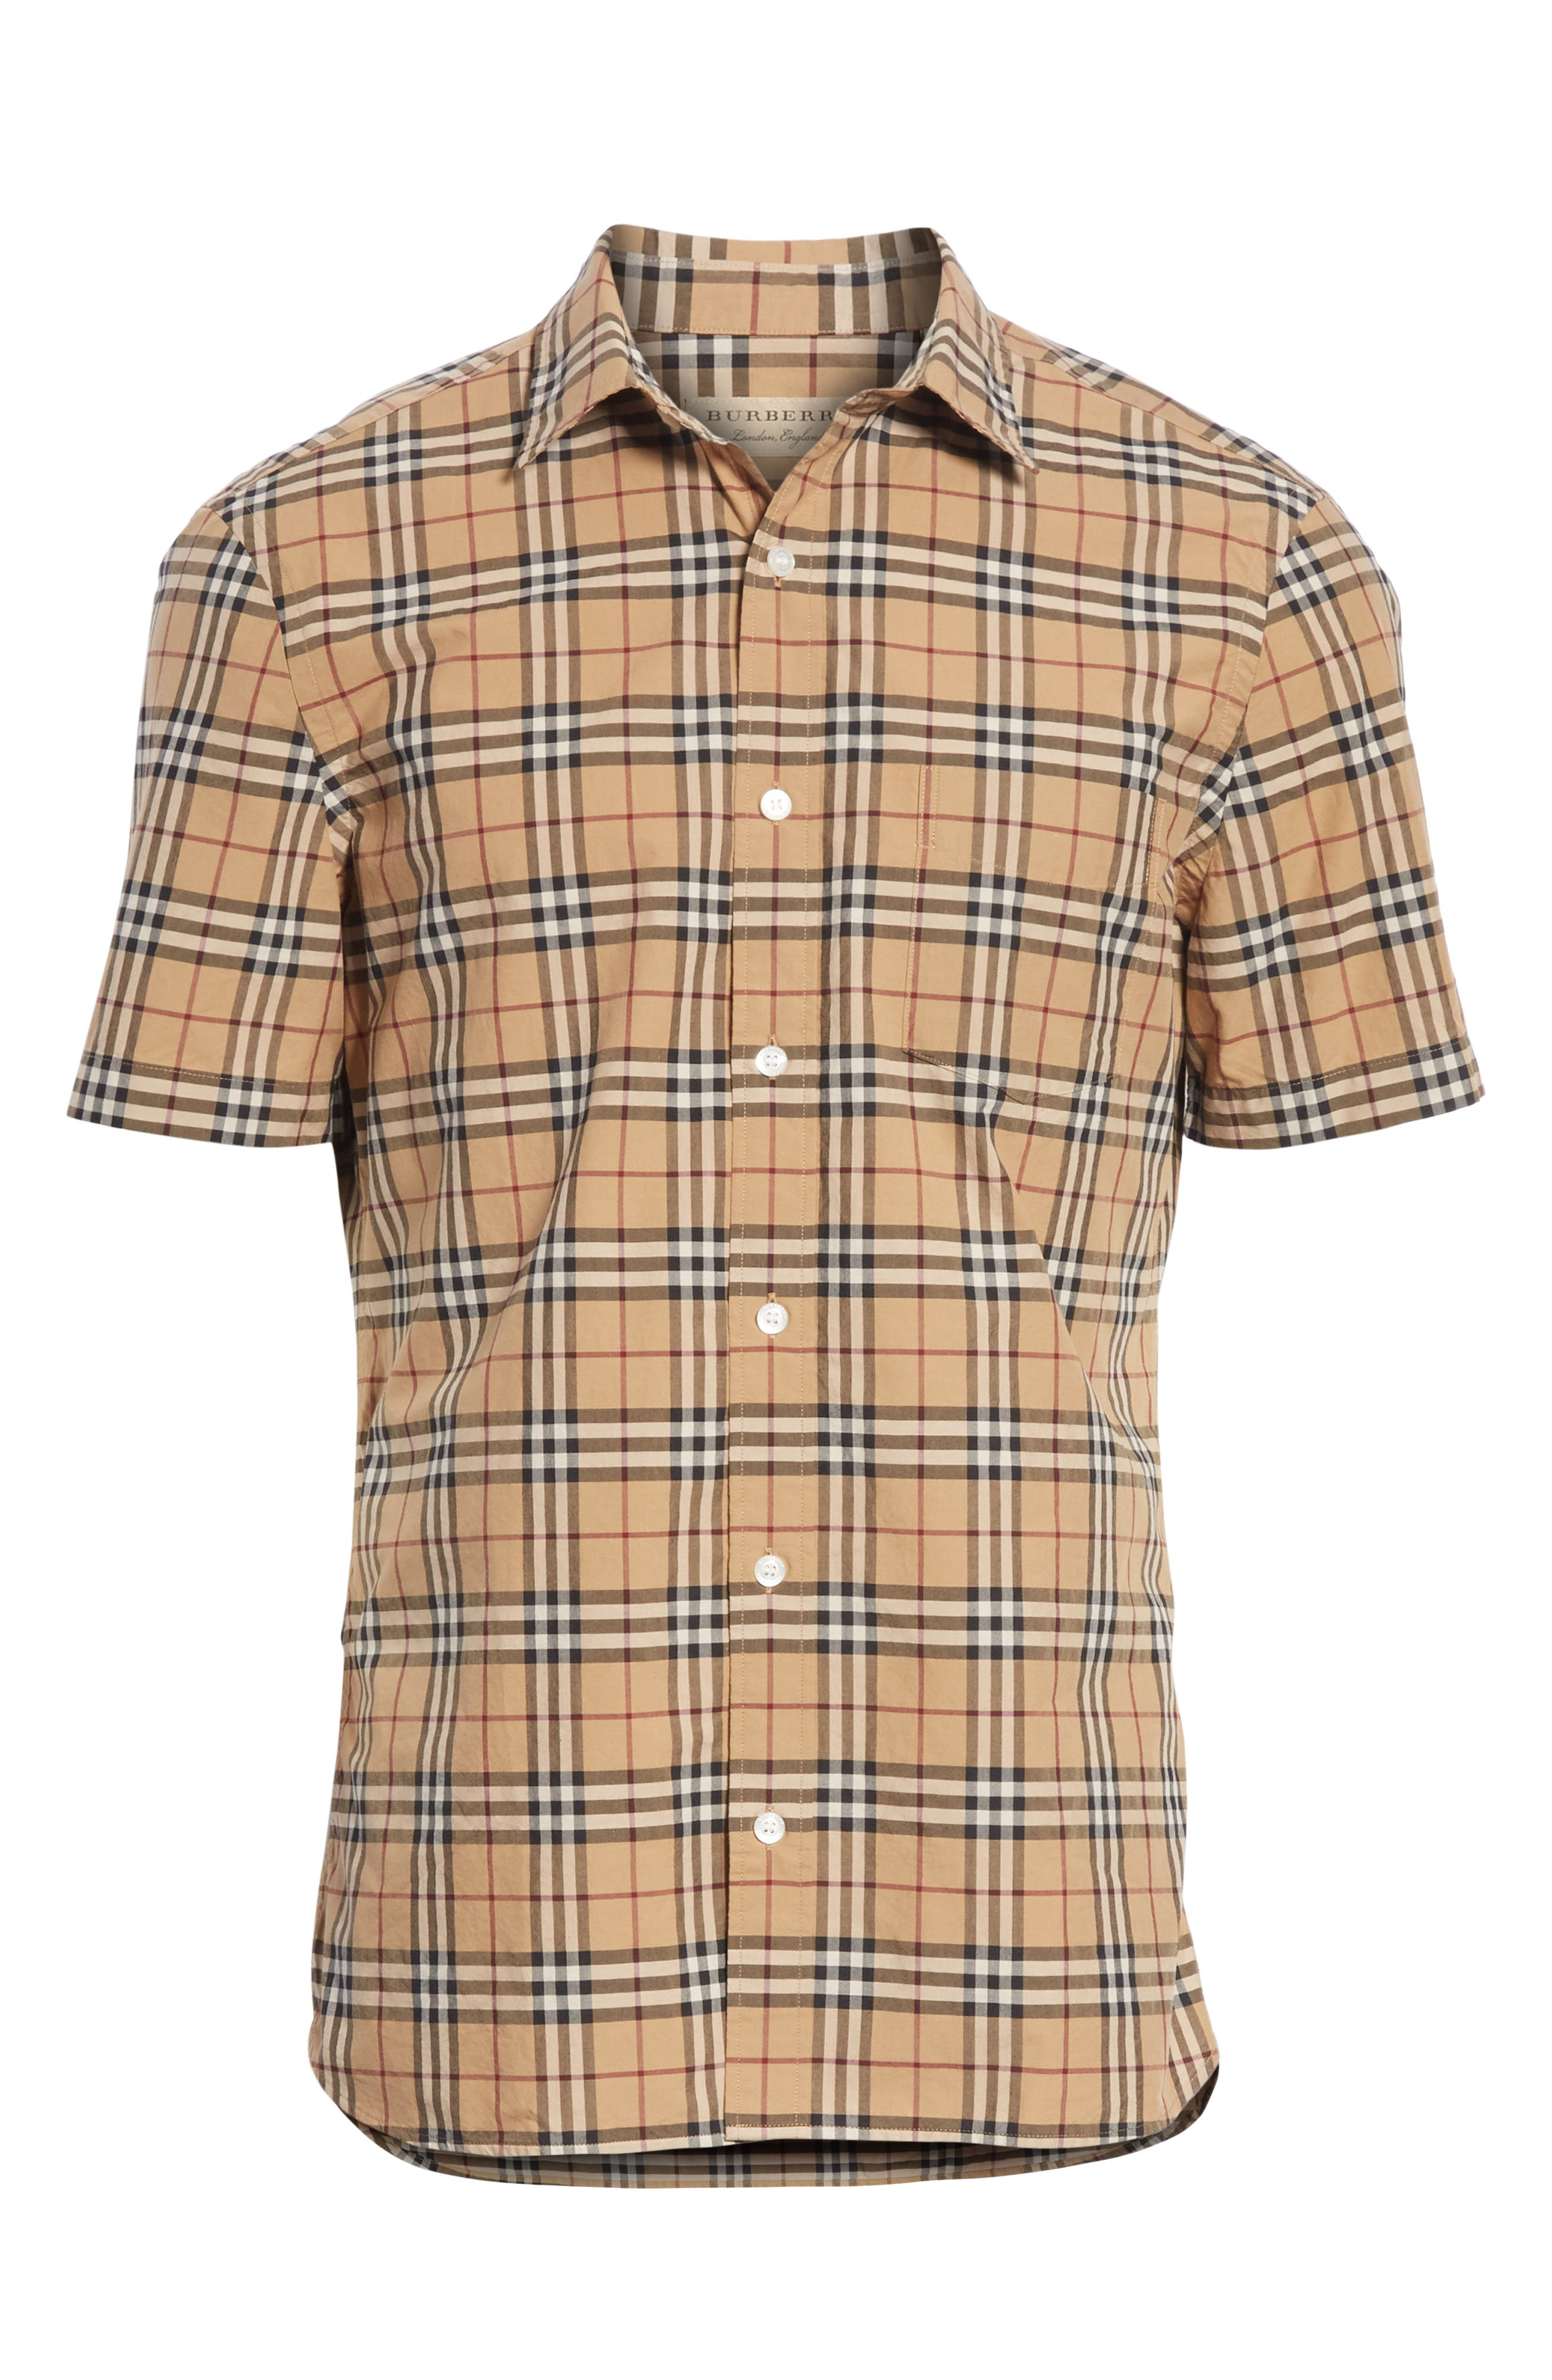 Alexander Check Sport Shirt,                             Alternate thumbnail 6, color,                             250